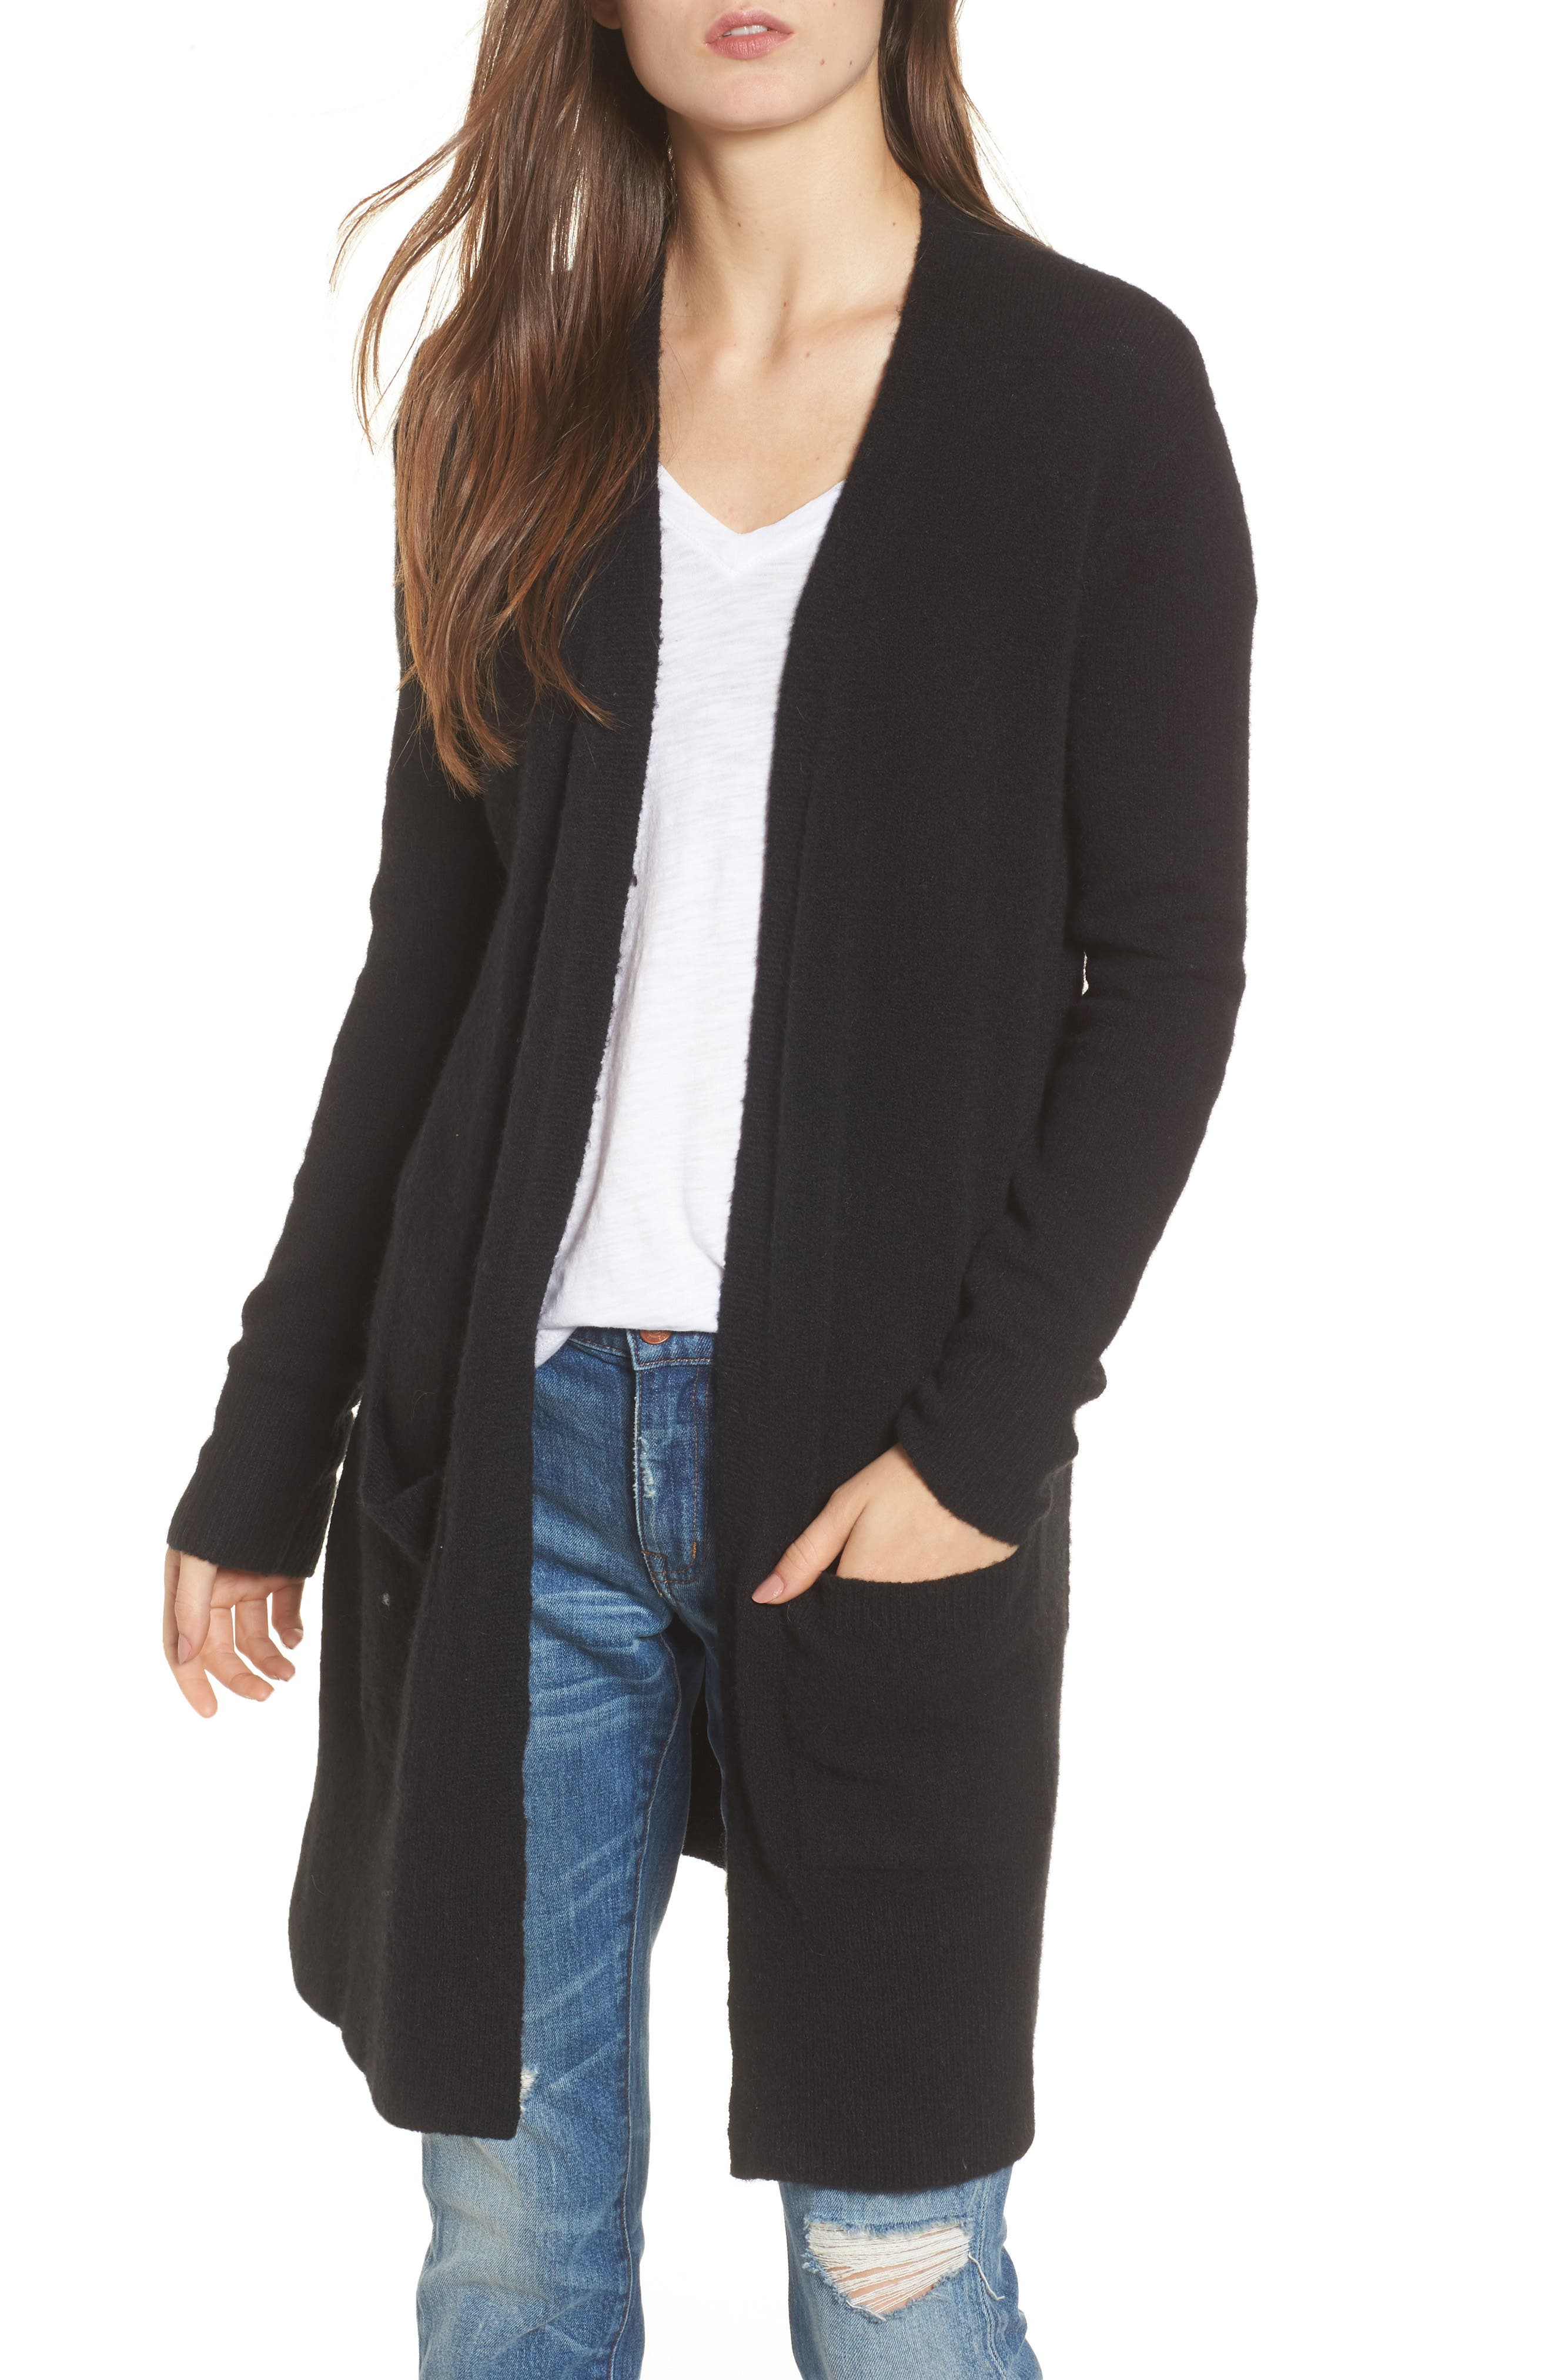 MADEWELL, Kent Cardigan Sweater, Main thumbnail 1, color, TRUE BLACK